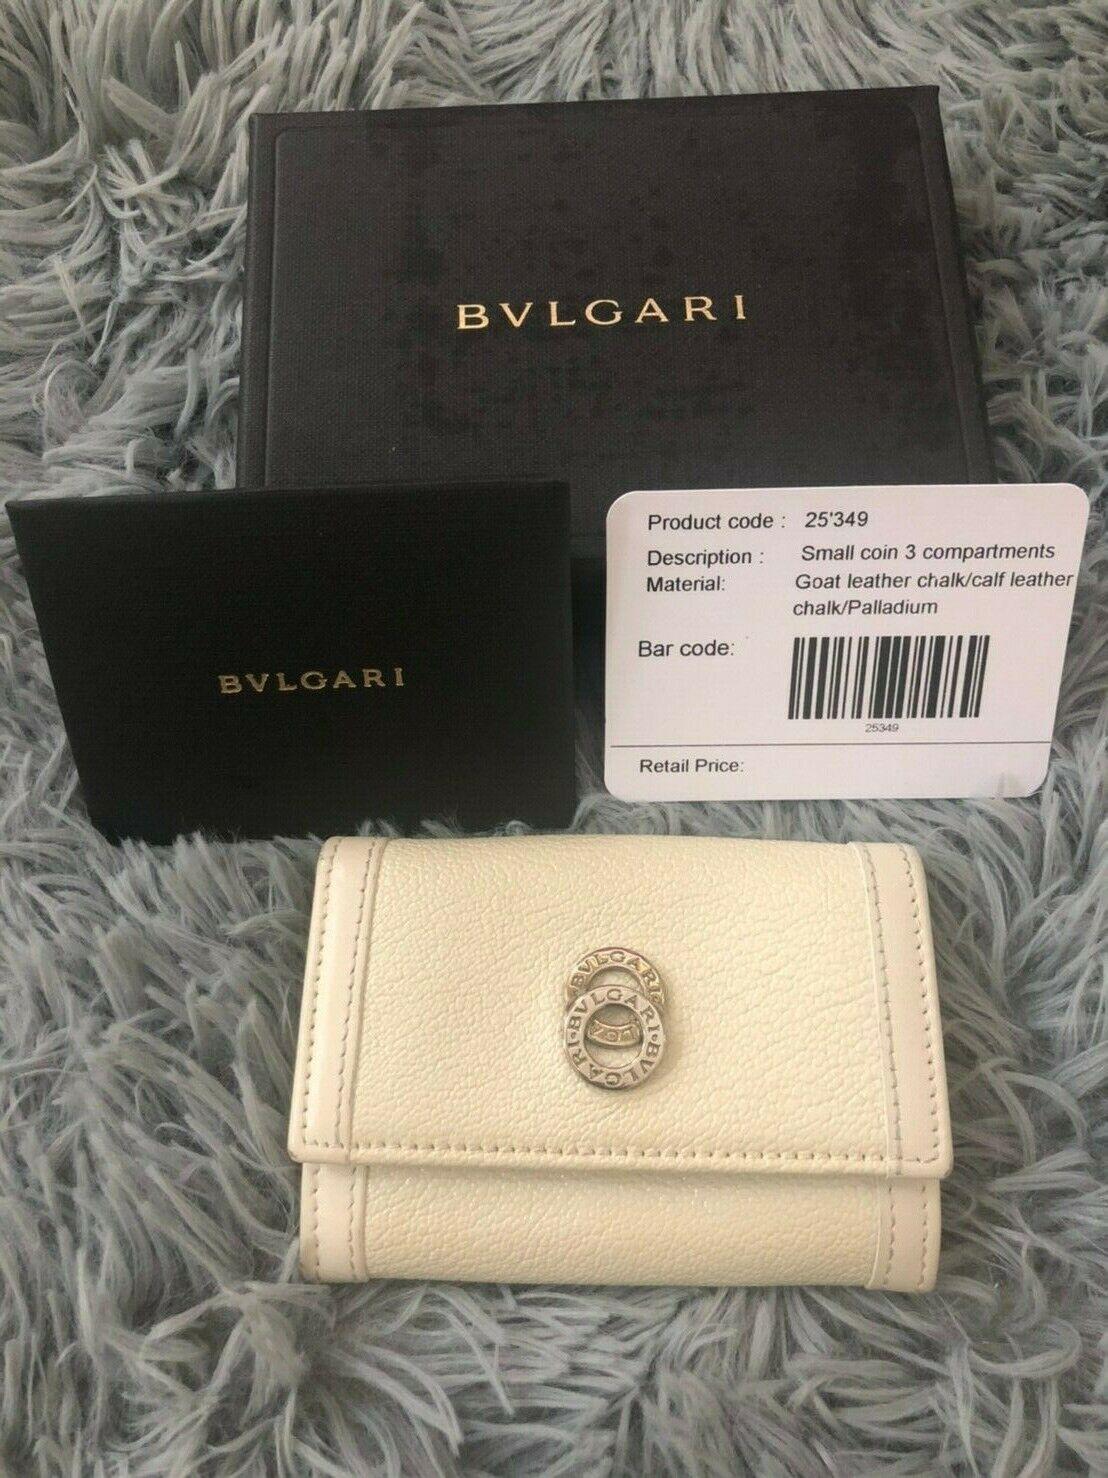 BVLGARI Goat/Calf Leather Logo Small Card Coin 3 Compartment Holder Lieiel Chalk